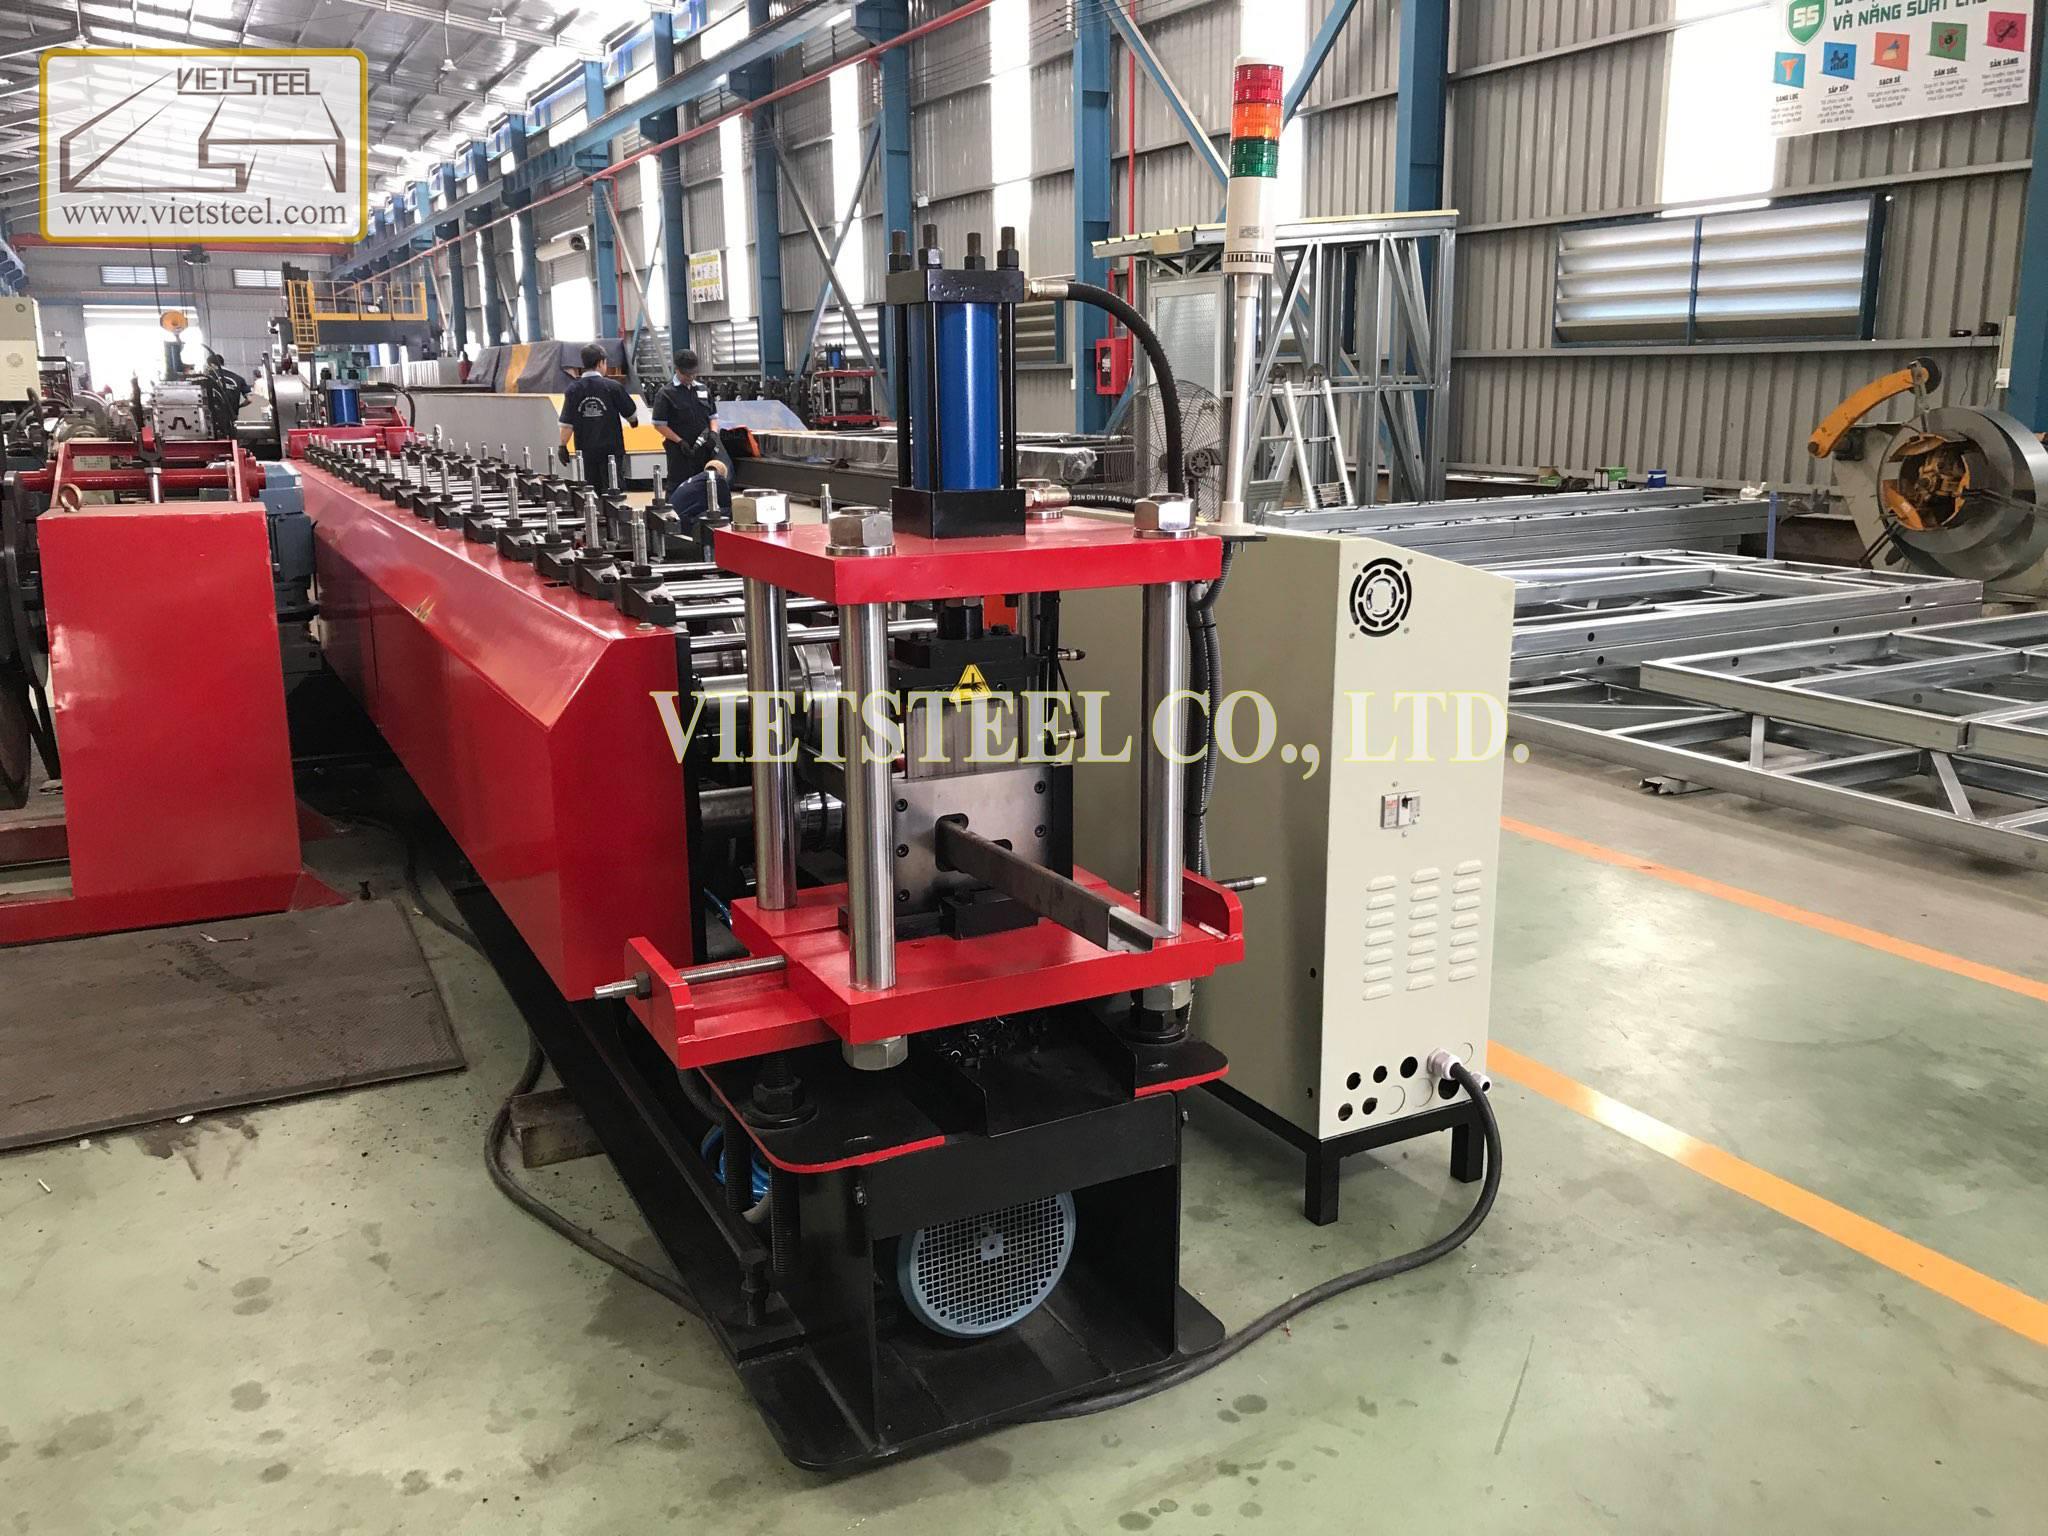 Vietsteel Floorbar roll forming machine (16-20 mpm)